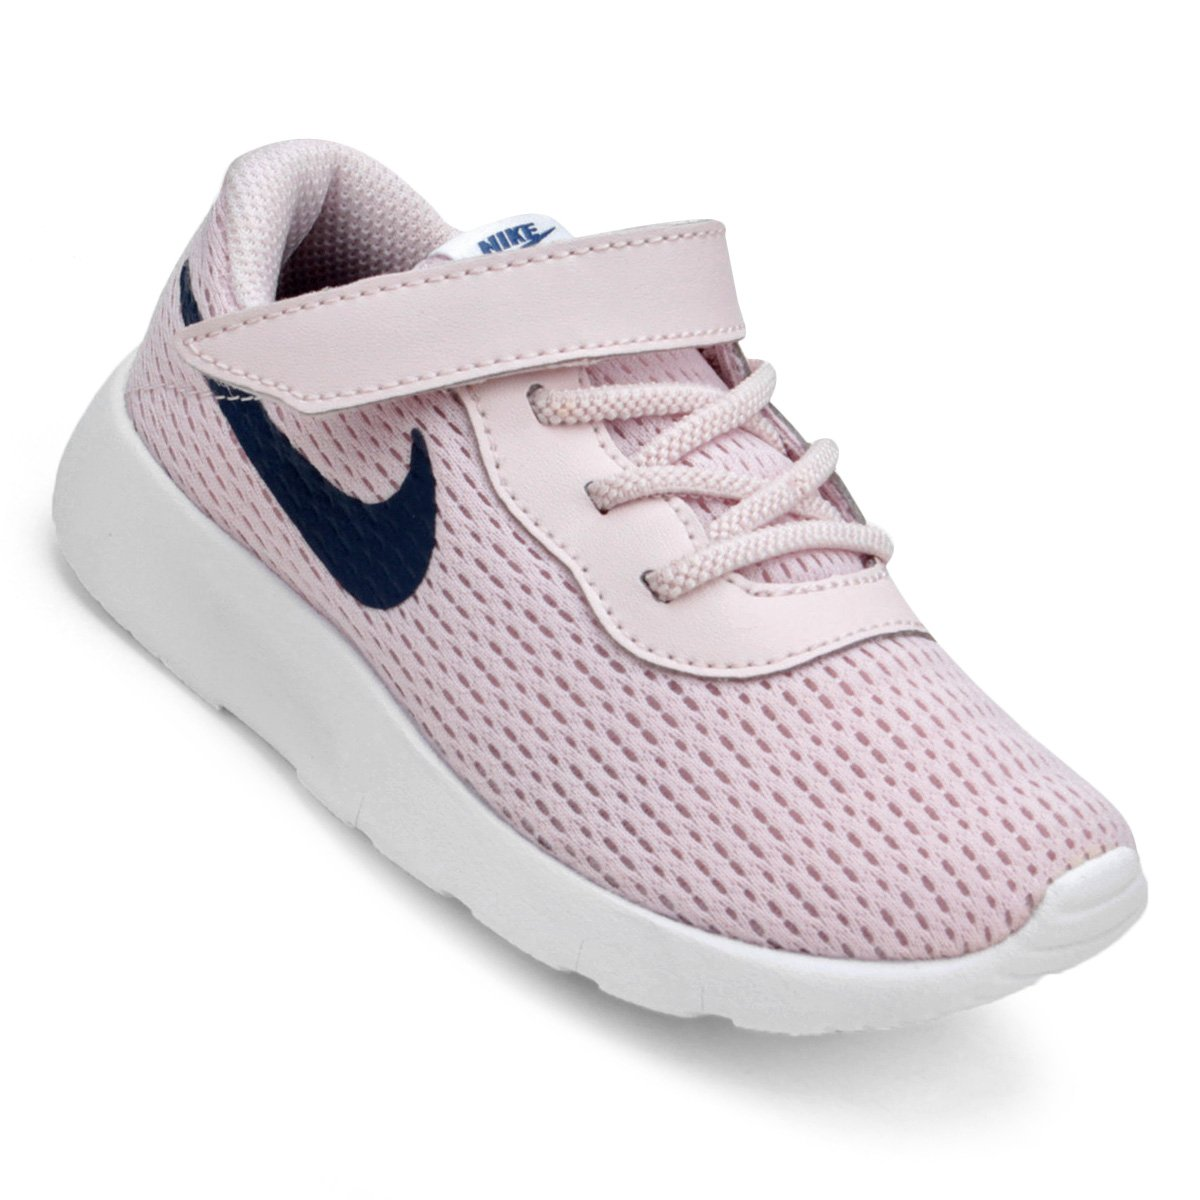 7b99b1df11f Tênis Infantil Nike Tanjun Feminino - Rosa Claro - Compre Agora ...